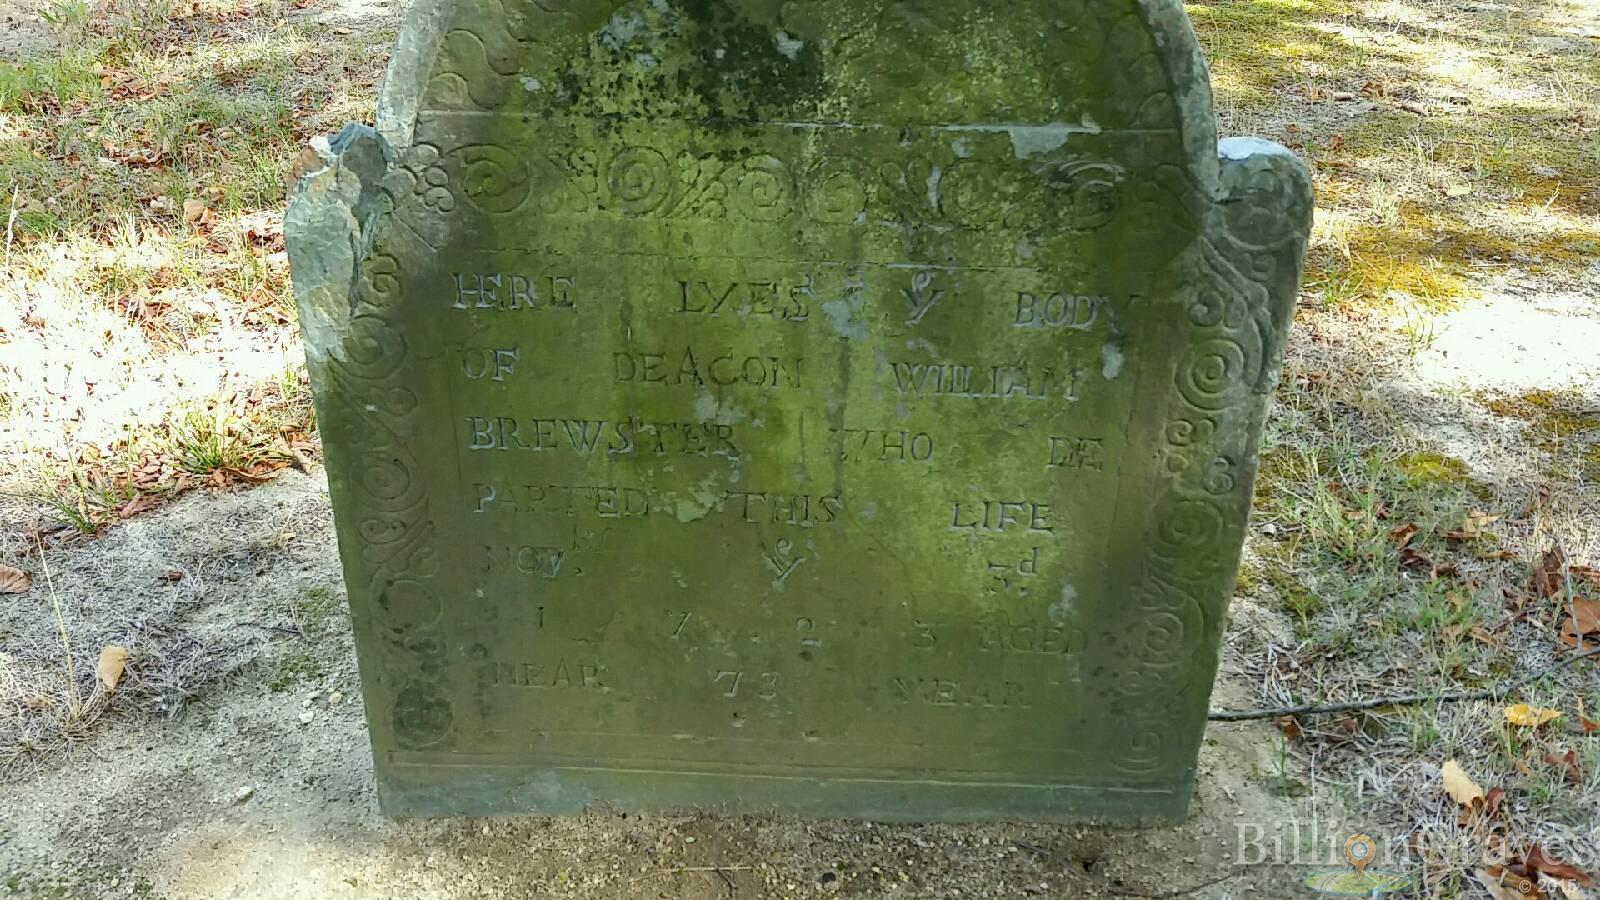 BillionGraves, gravestone, grave, damaged gravestones, cemetery, family history, ancestors, community service project, JustServe, BillionGraves app, ivy, plant growth, JustServe, grave, Duxbury, Ma